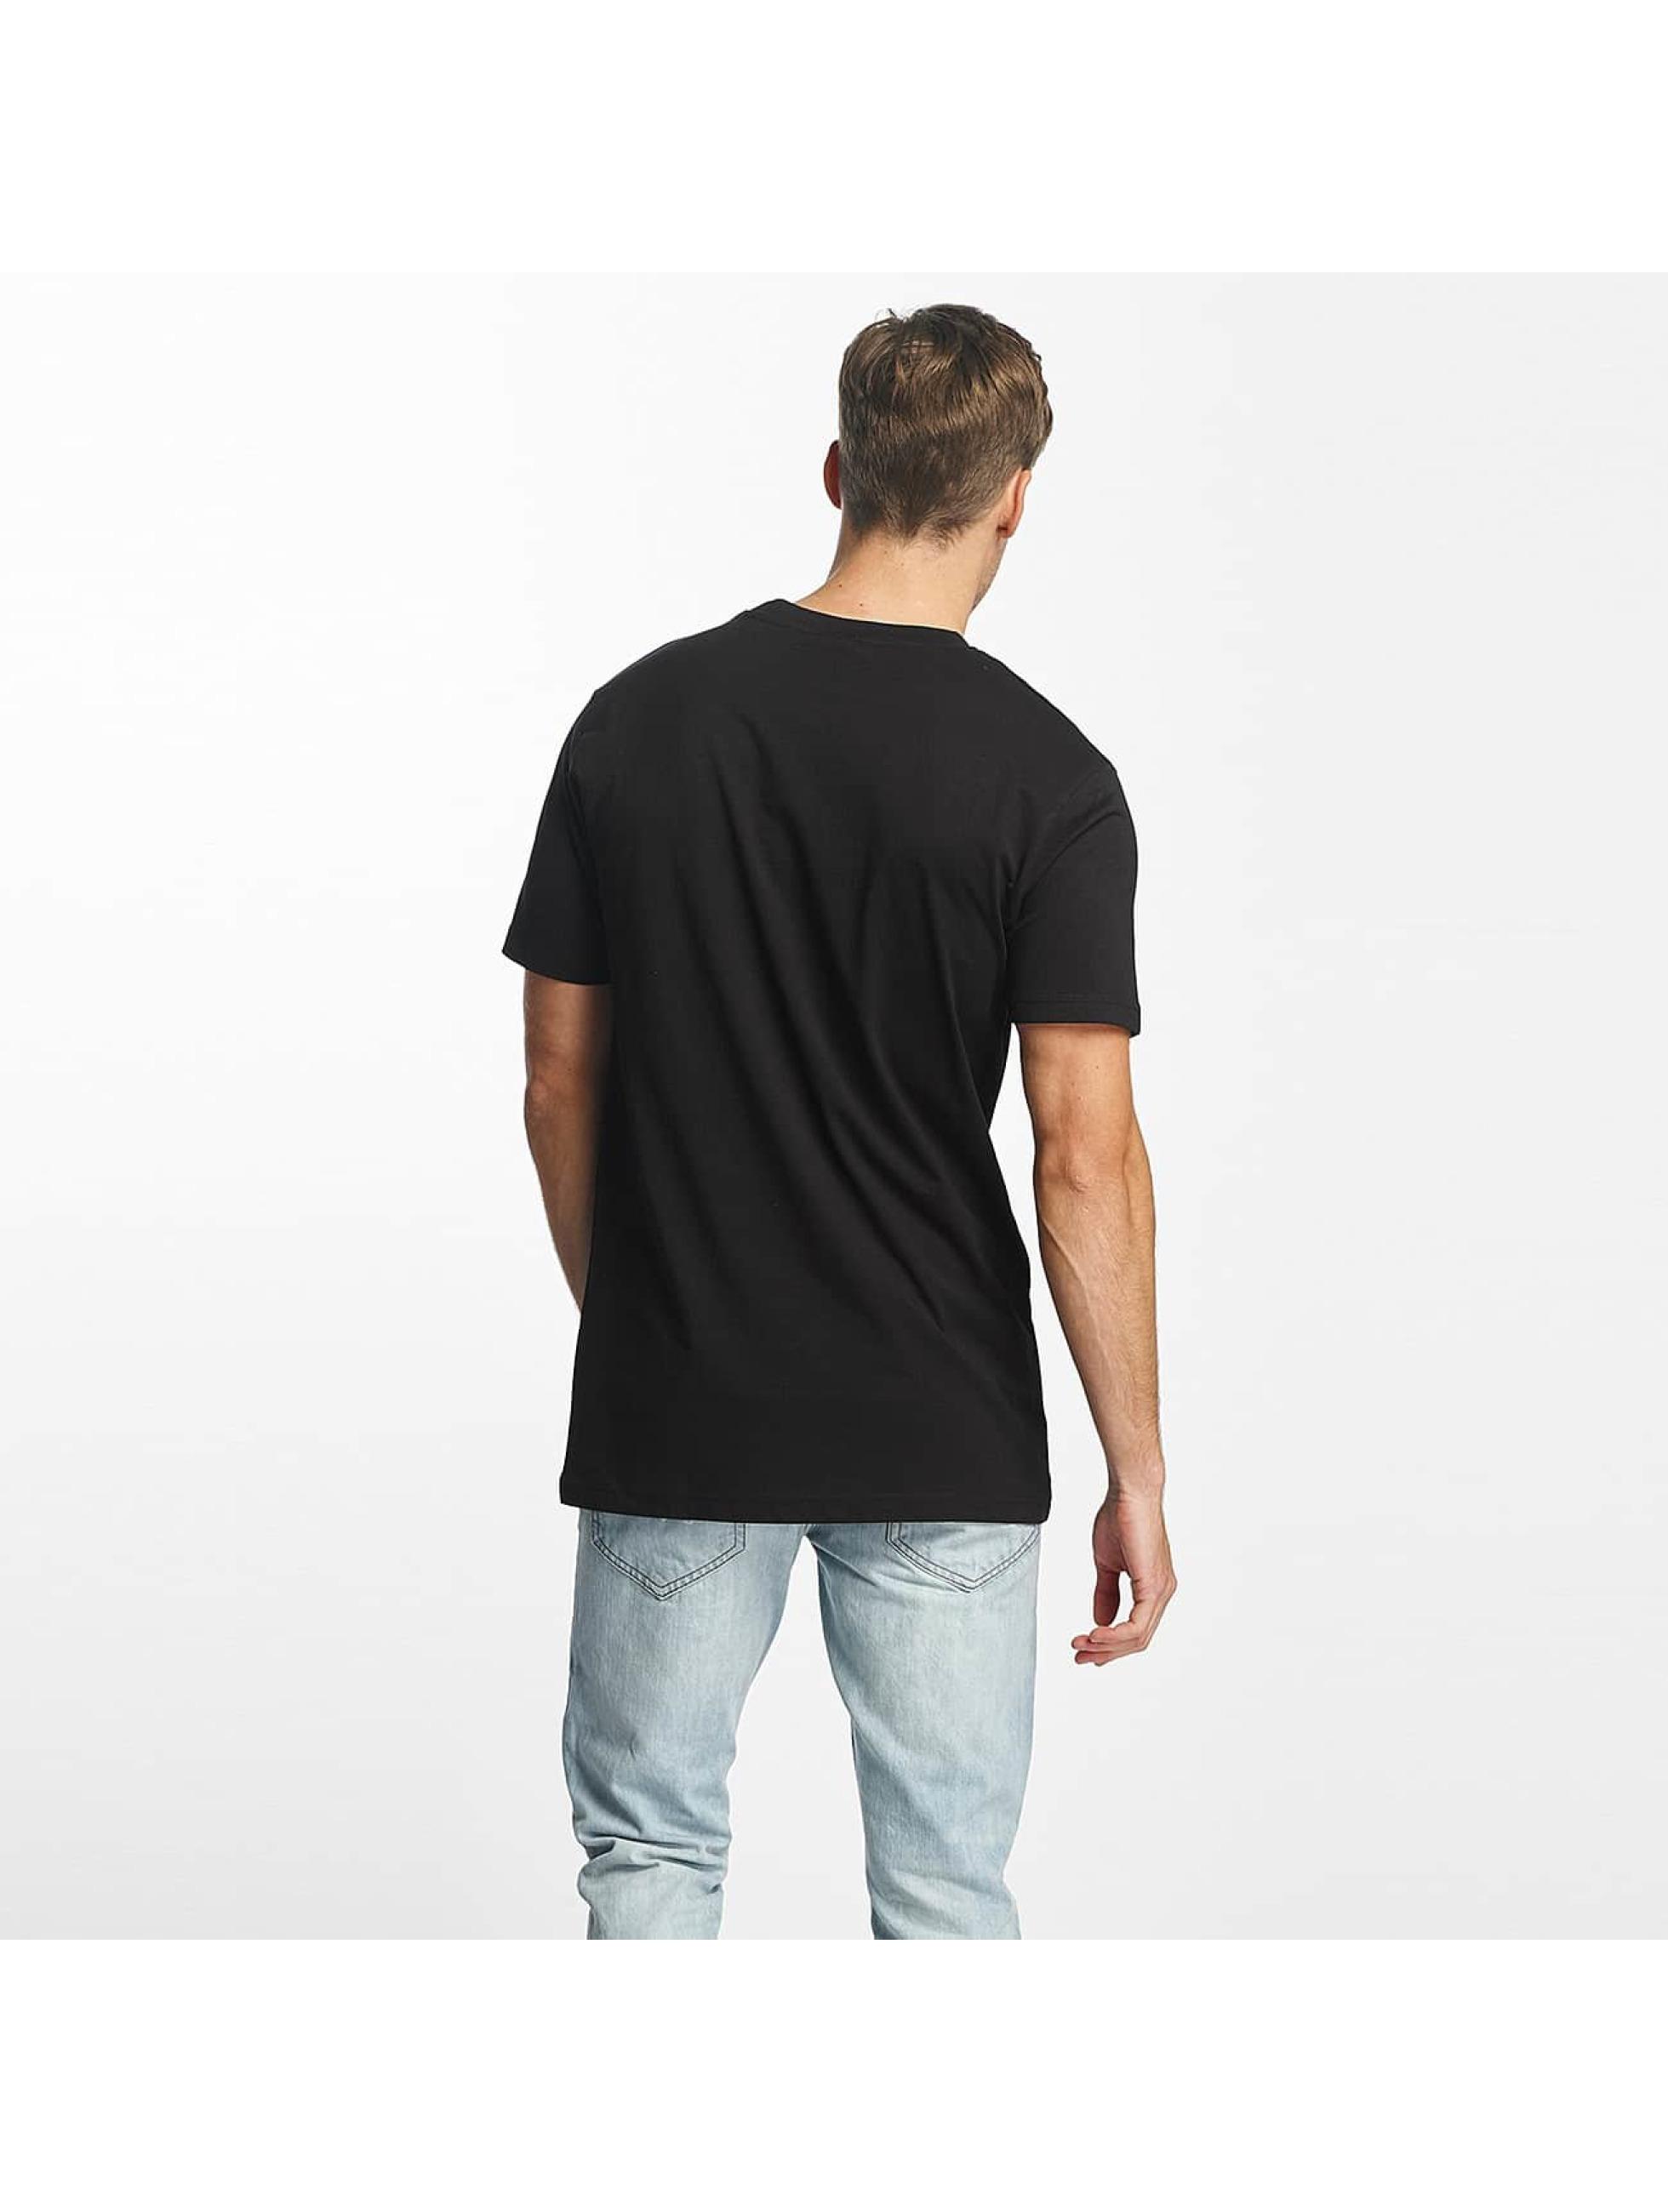 Mister Tee T-Shirt West 2020 black